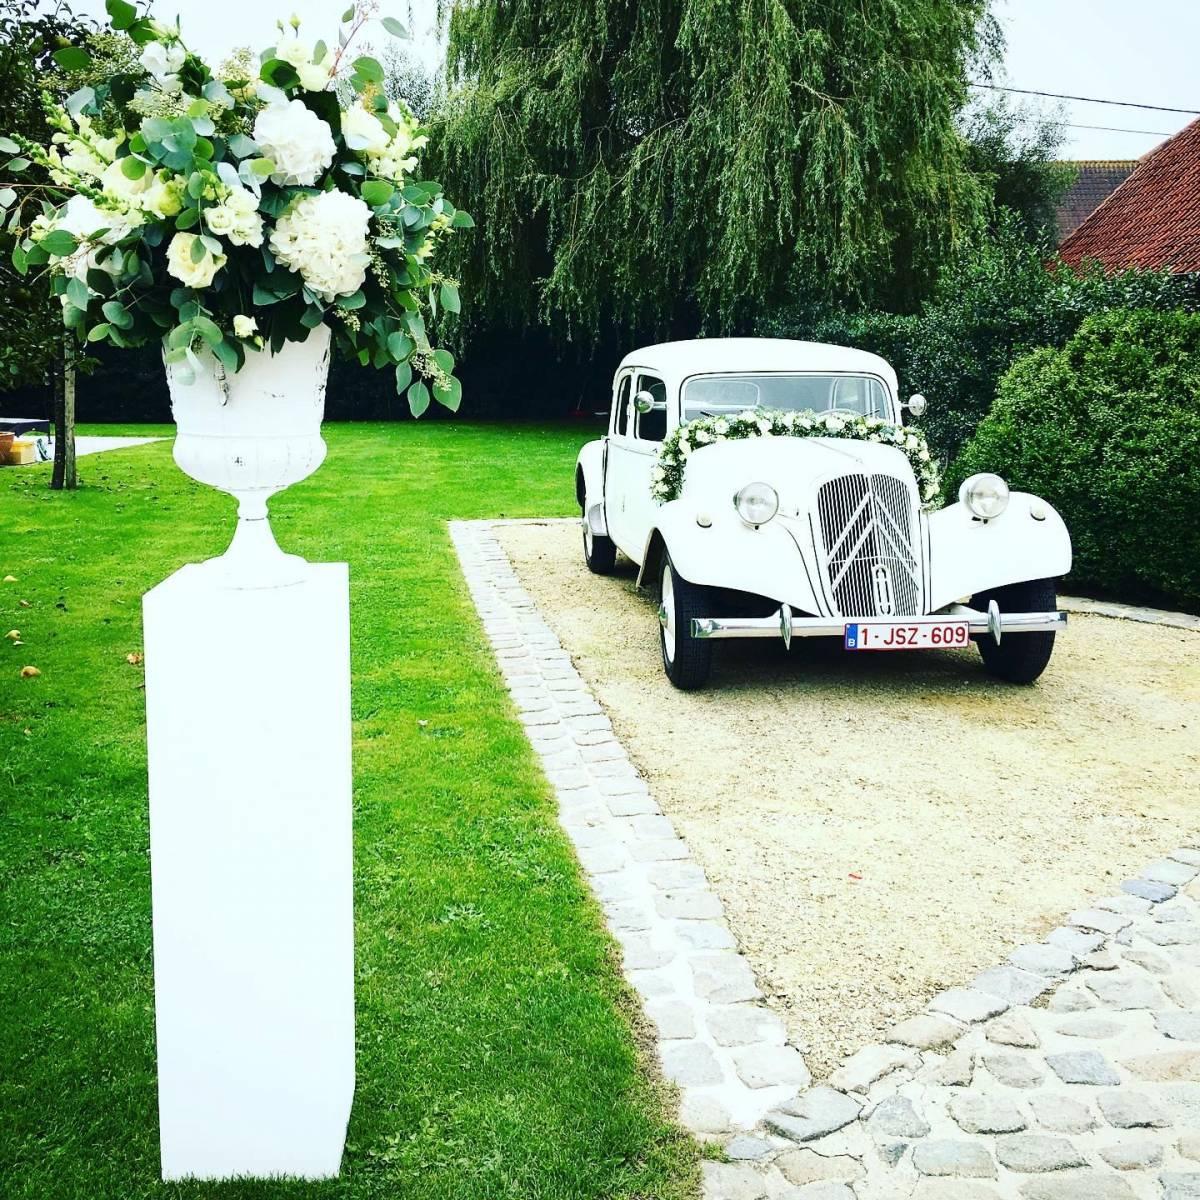 Maison Fleurie - Fotograaf zelfgetrokken - House of Weddings - 23